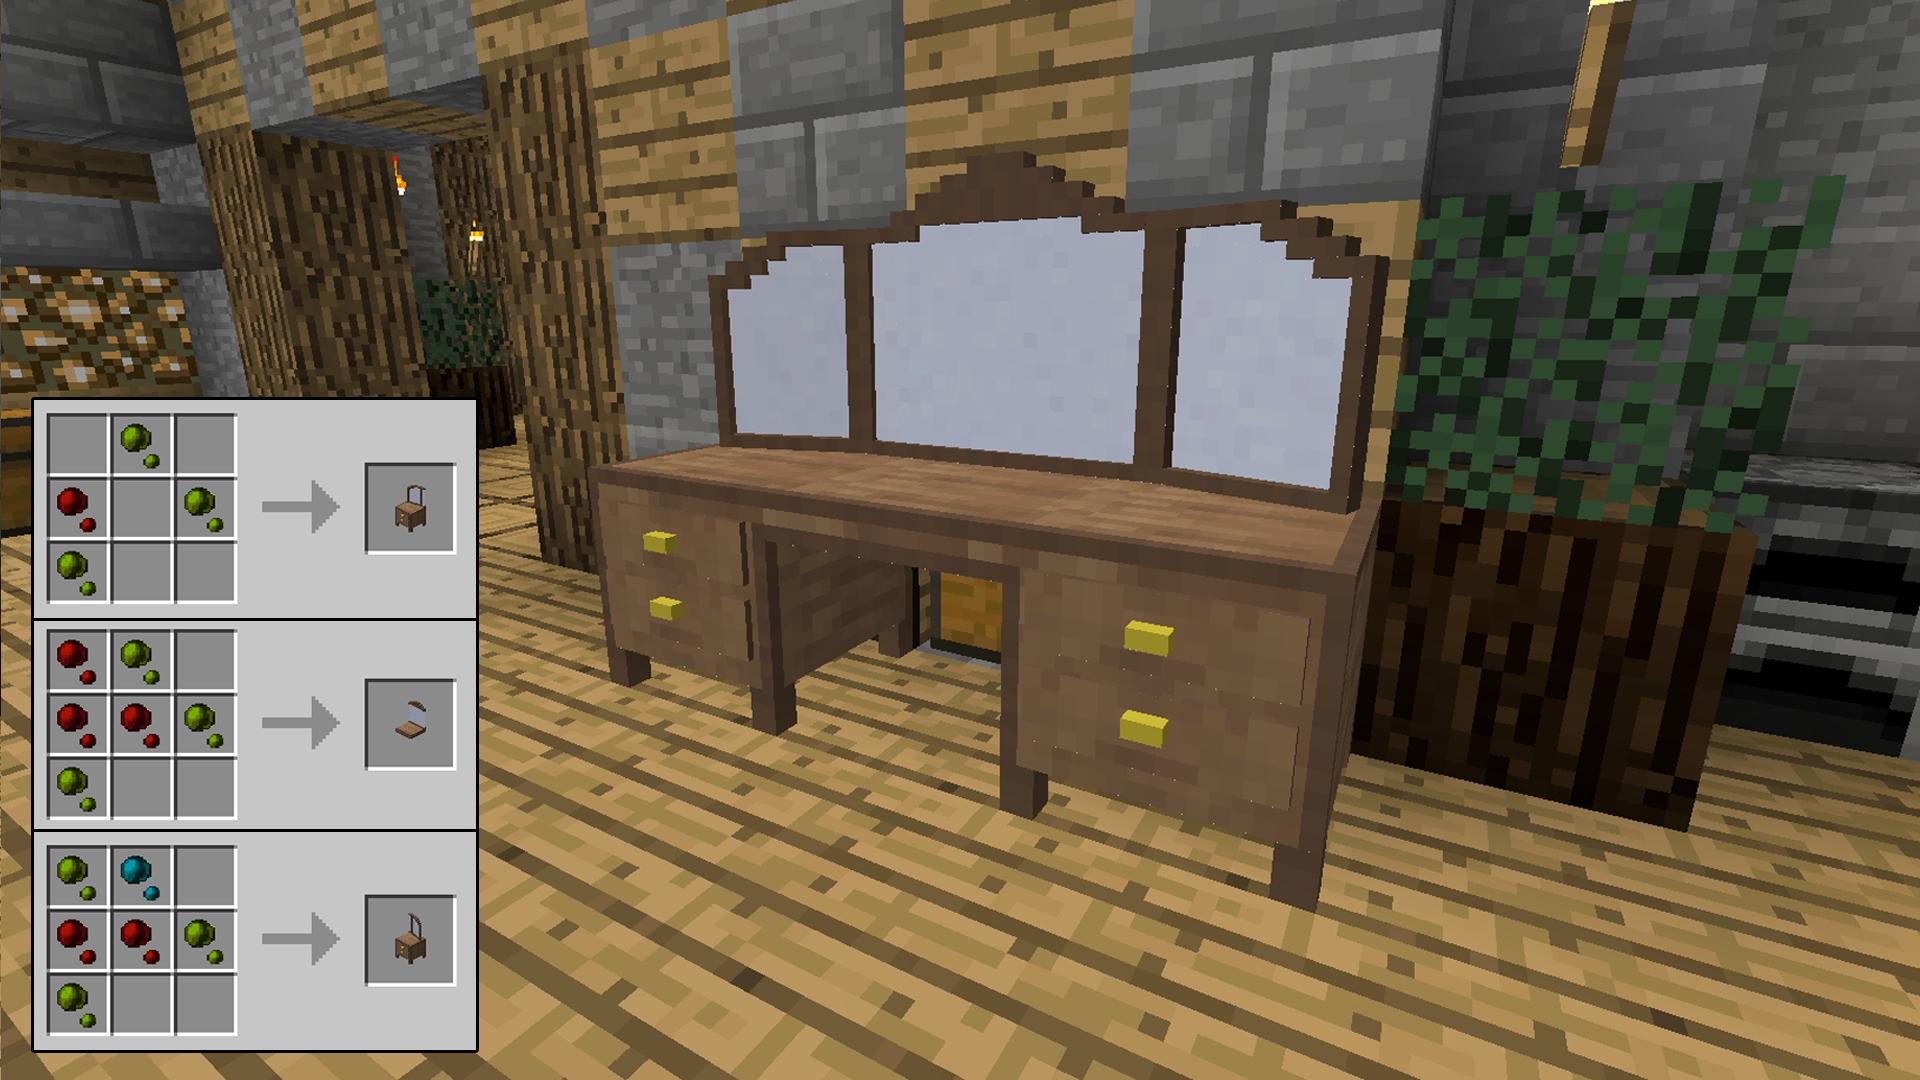 моды для майнкрафт 1.10.2 на мебель #8